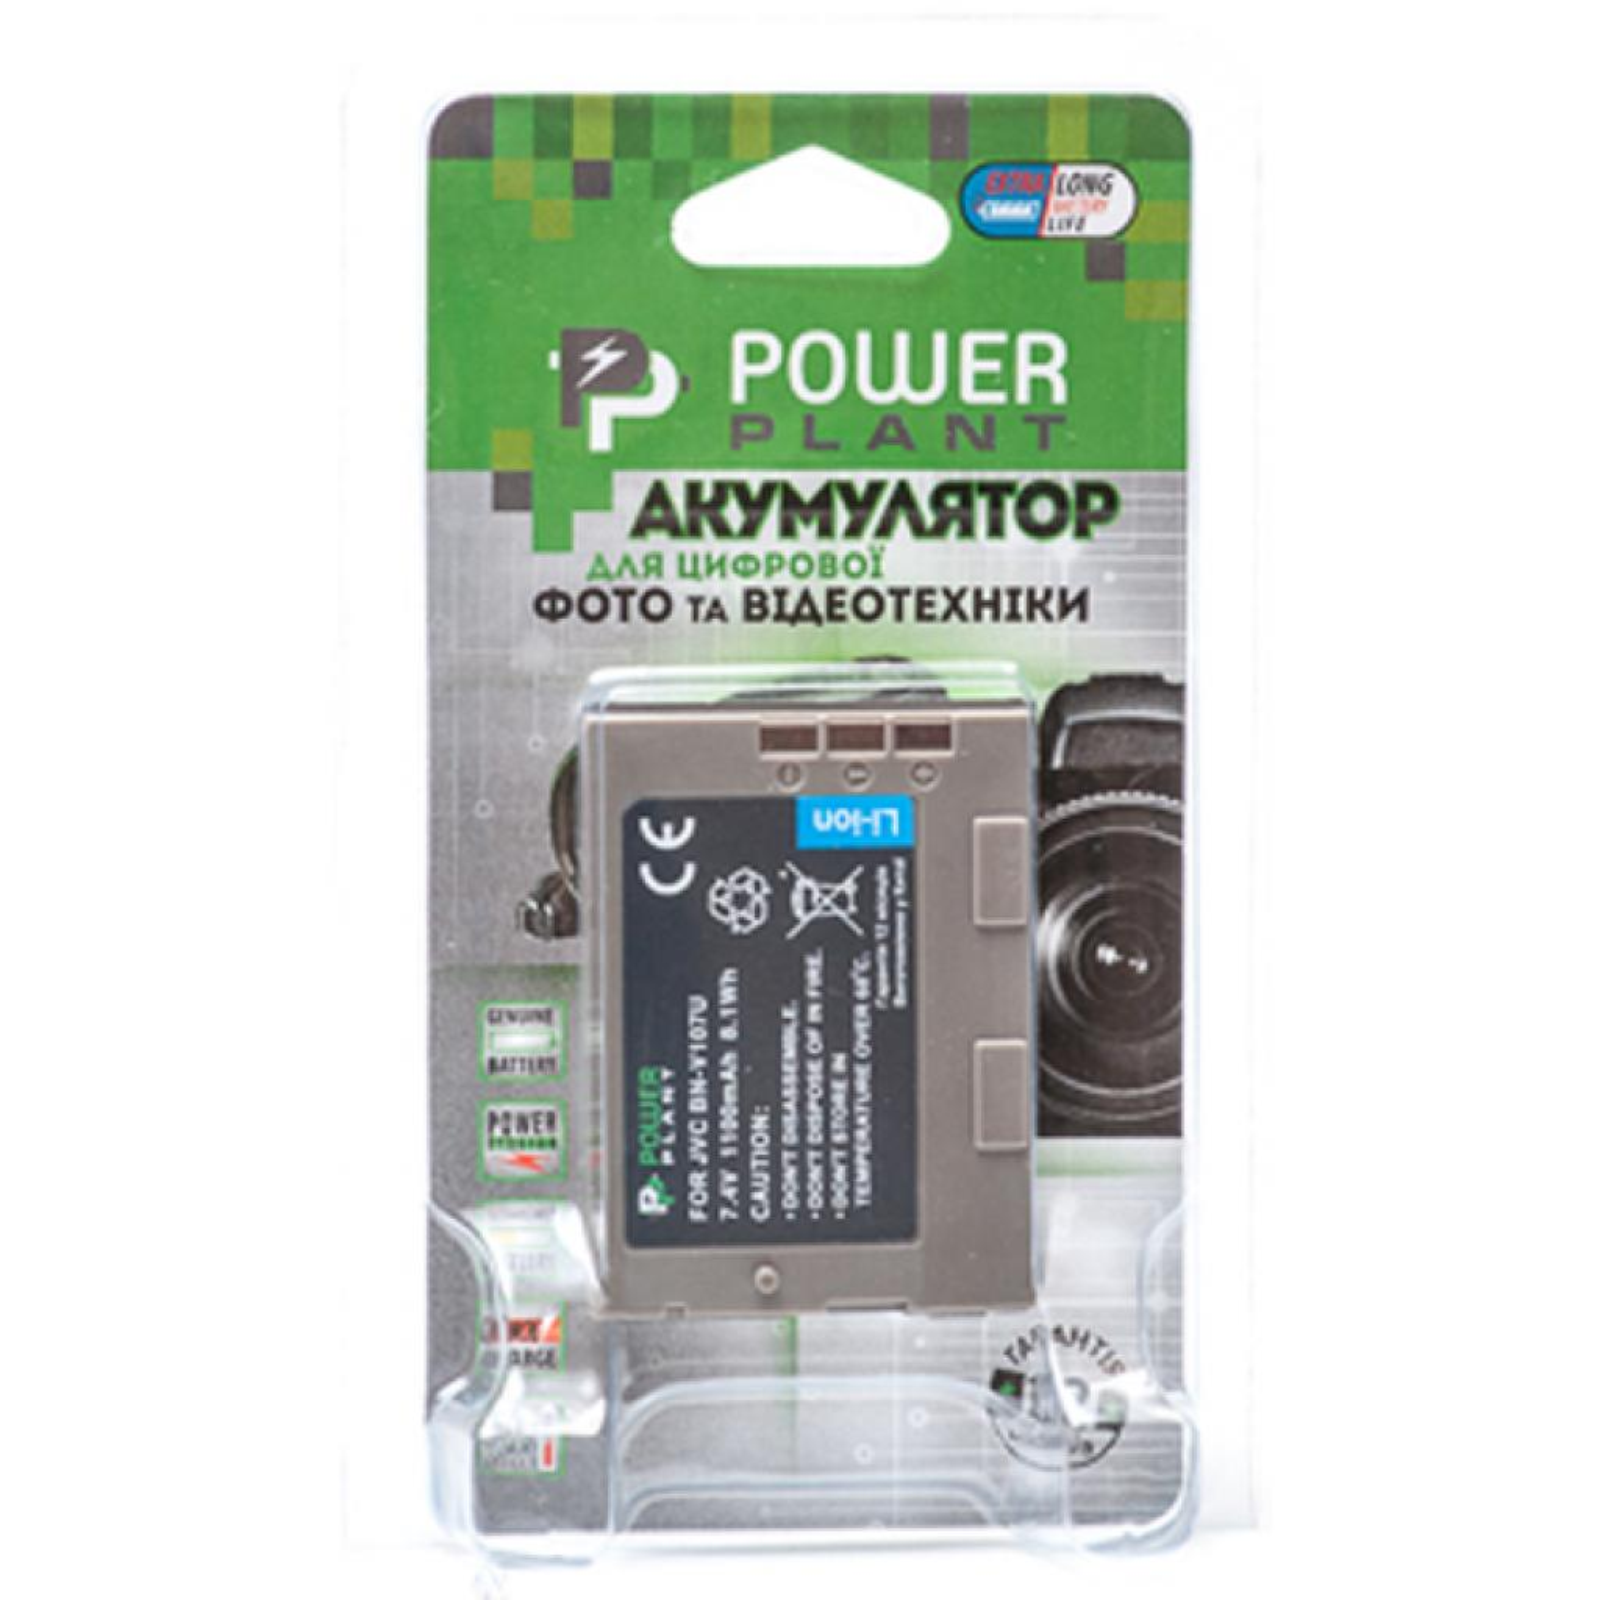 Аккумулятор к фото/видео PowerPlant JVC BN-V107U (DV00DV1185) изображение 3